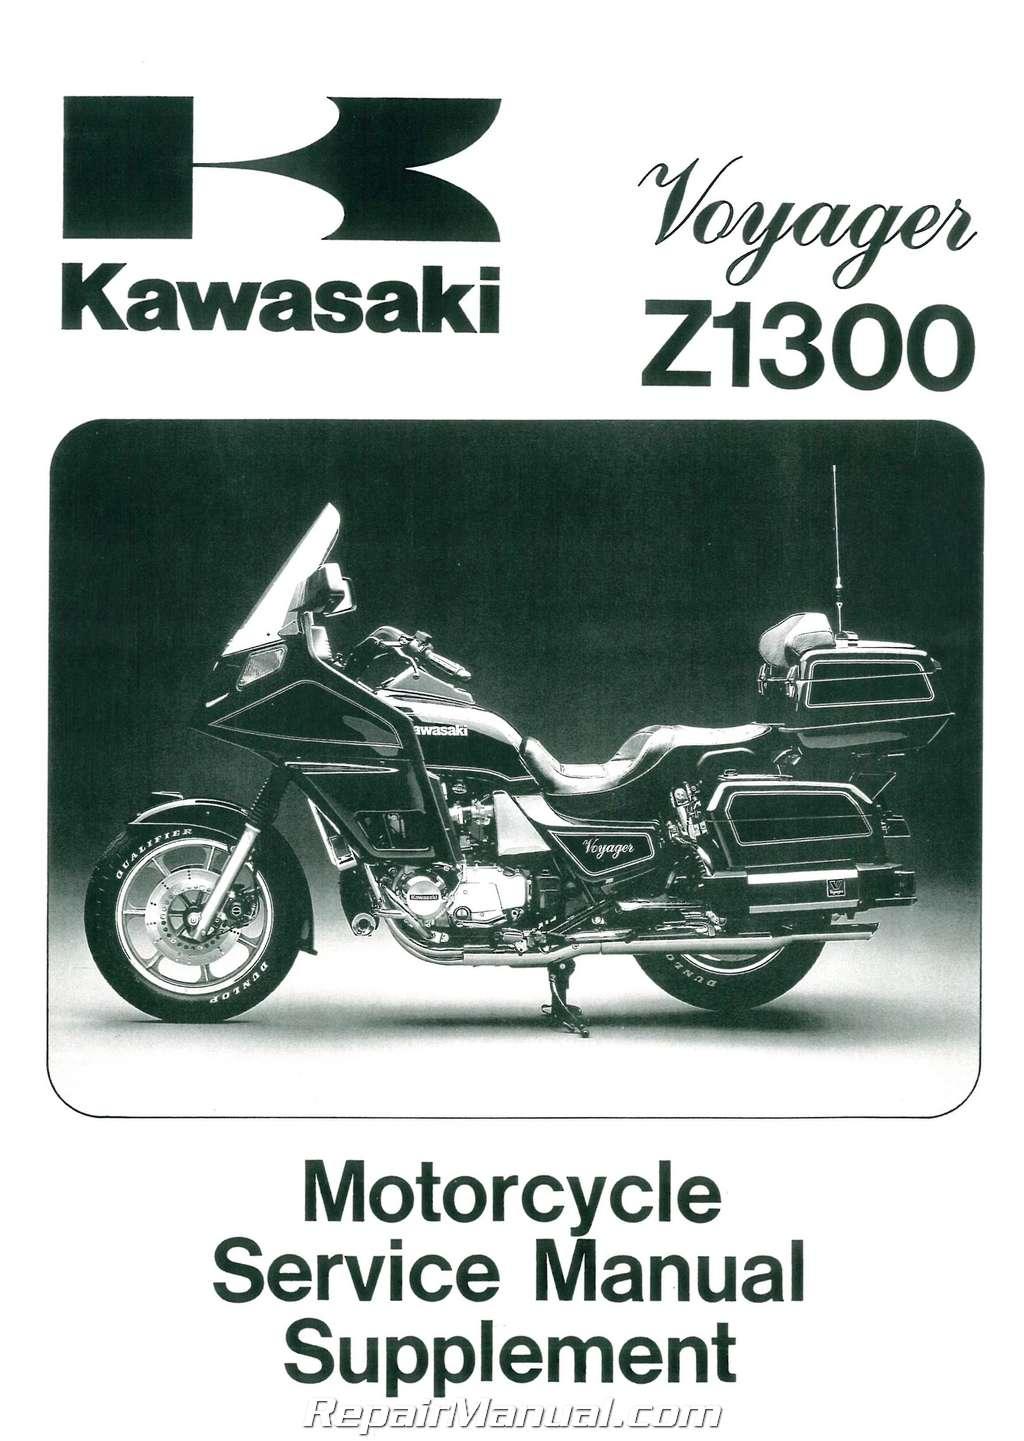 hight resolution of 1983 1989 kawasaki voyager zn1300 motorcycle service manual supplement